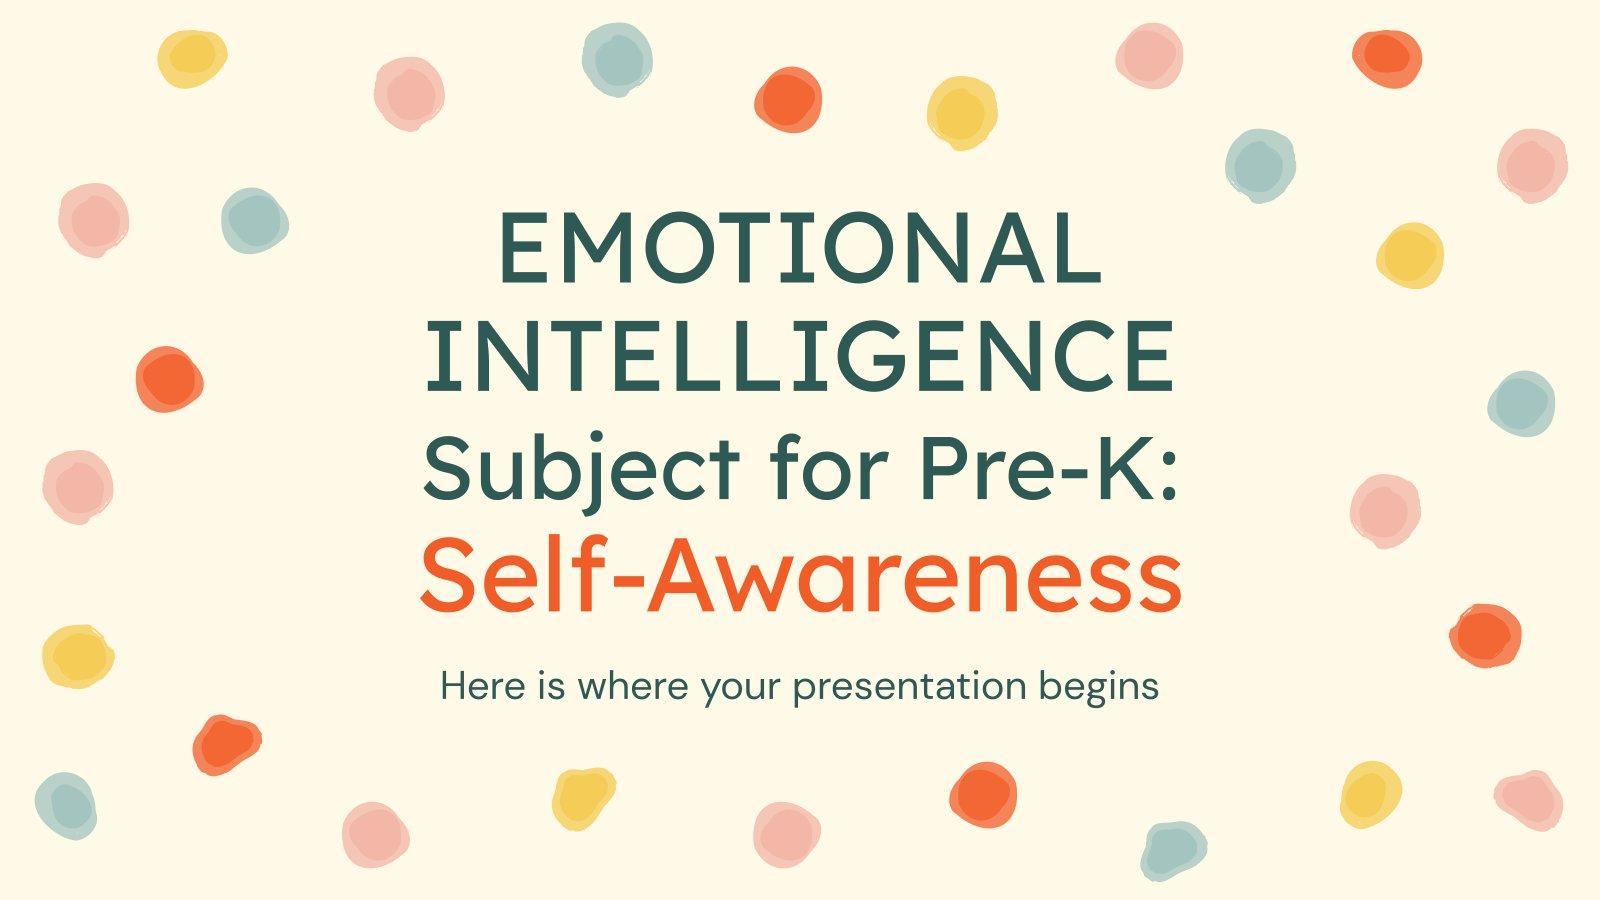 Emotional Intelligence Subject for Pre-K: Self-Awareness presentation template